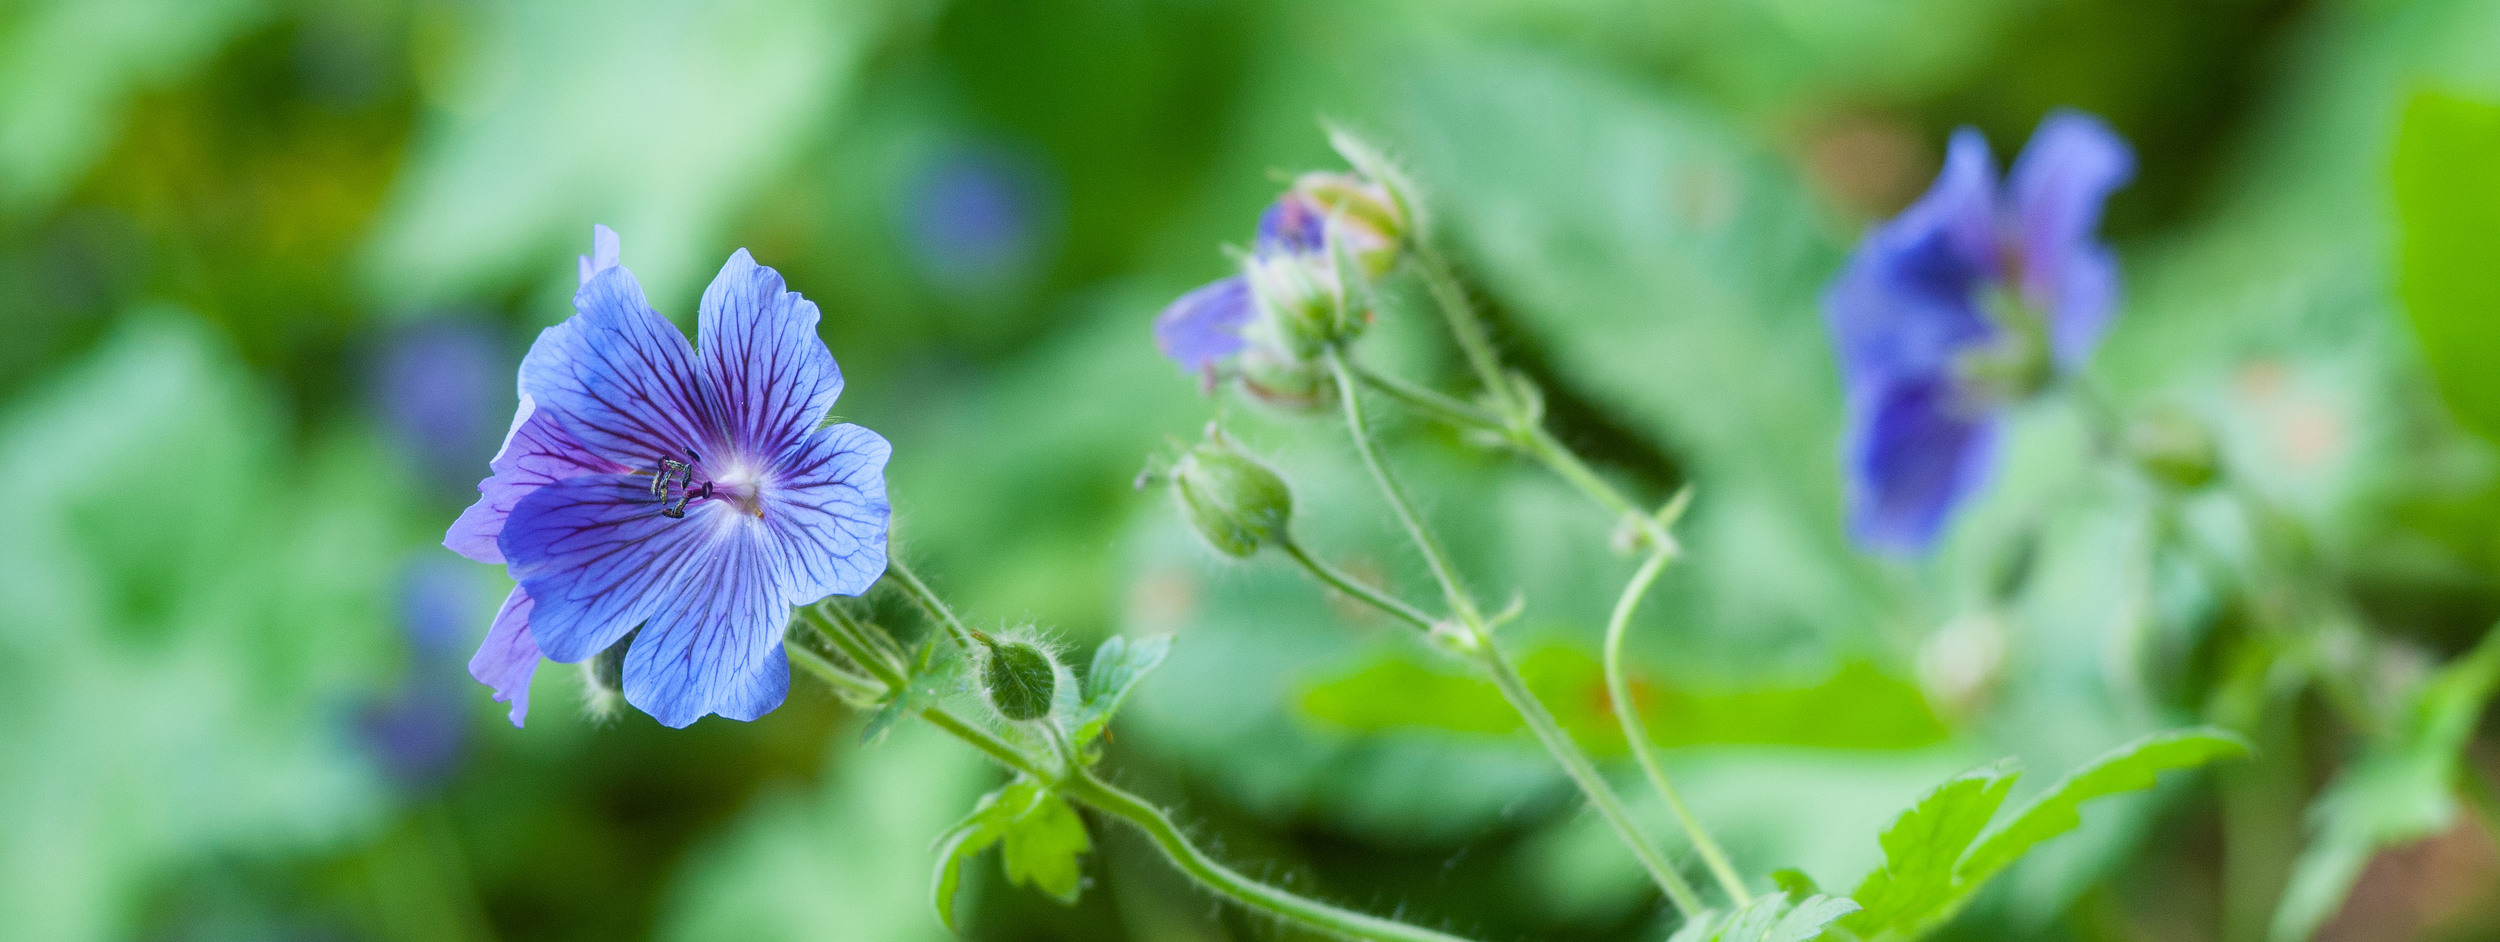 _DSC4120 blue flowers for web.jpg